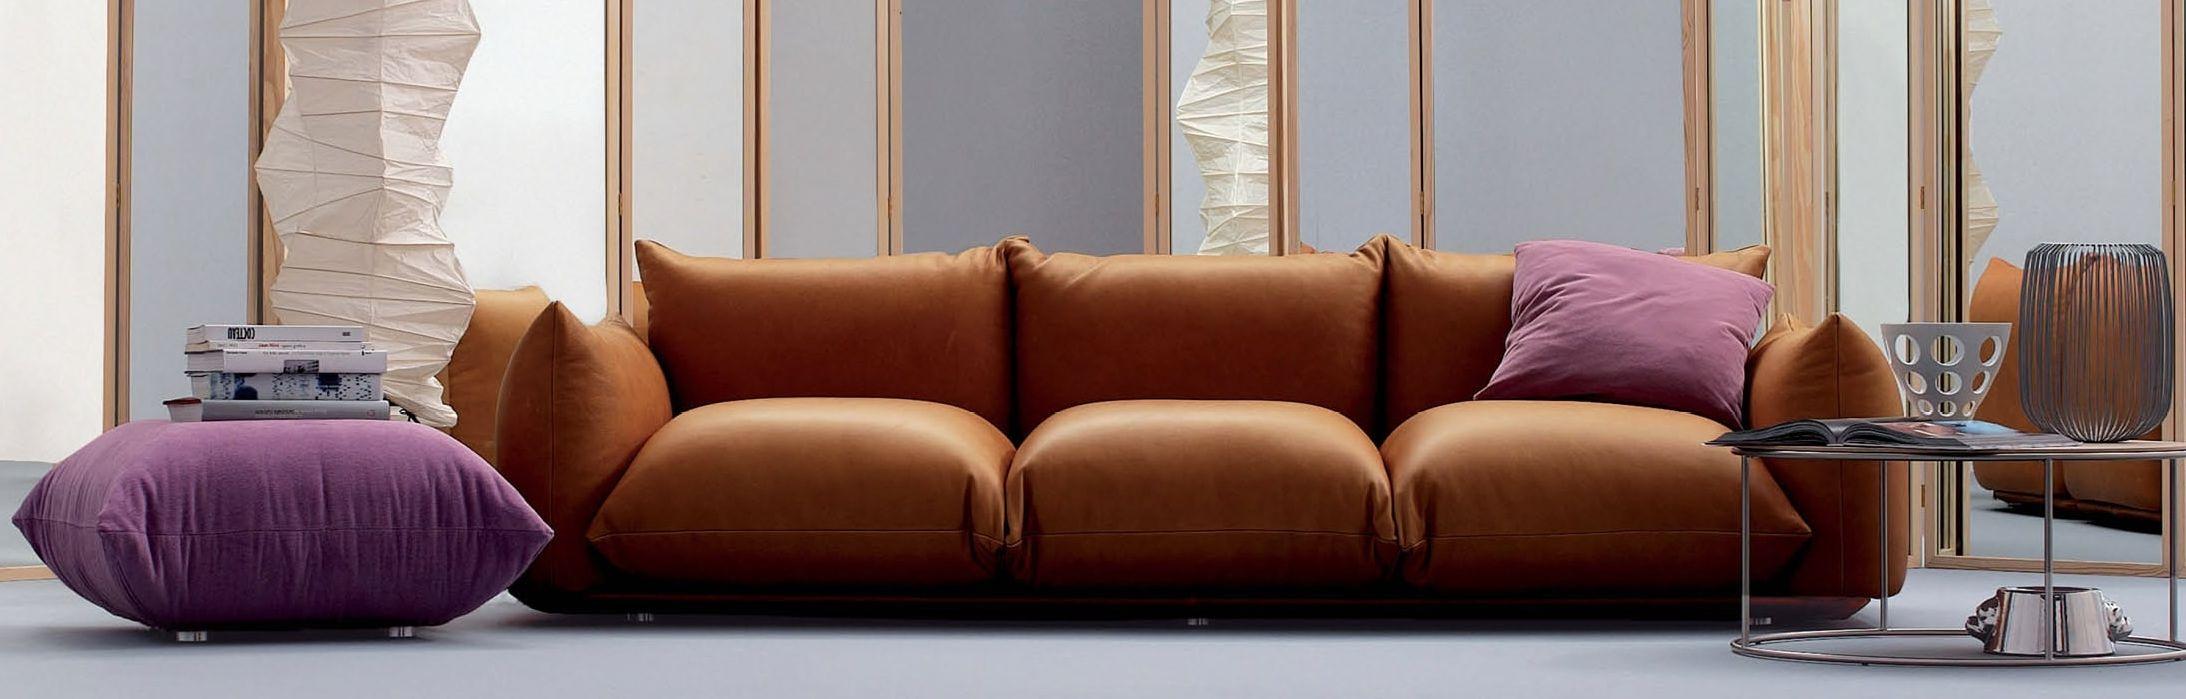 Arflex Marenco Leather Contemporary Italian Sofa